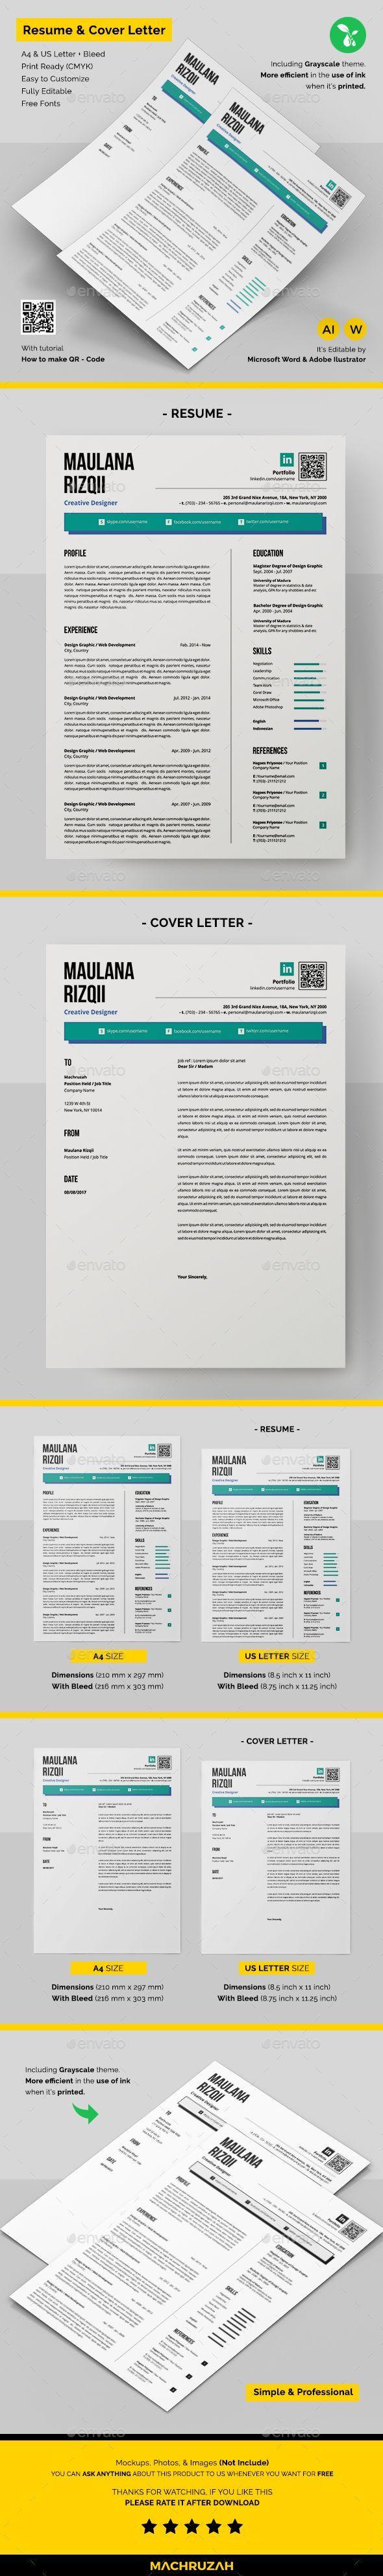 Resume 14 best Resume designs images on